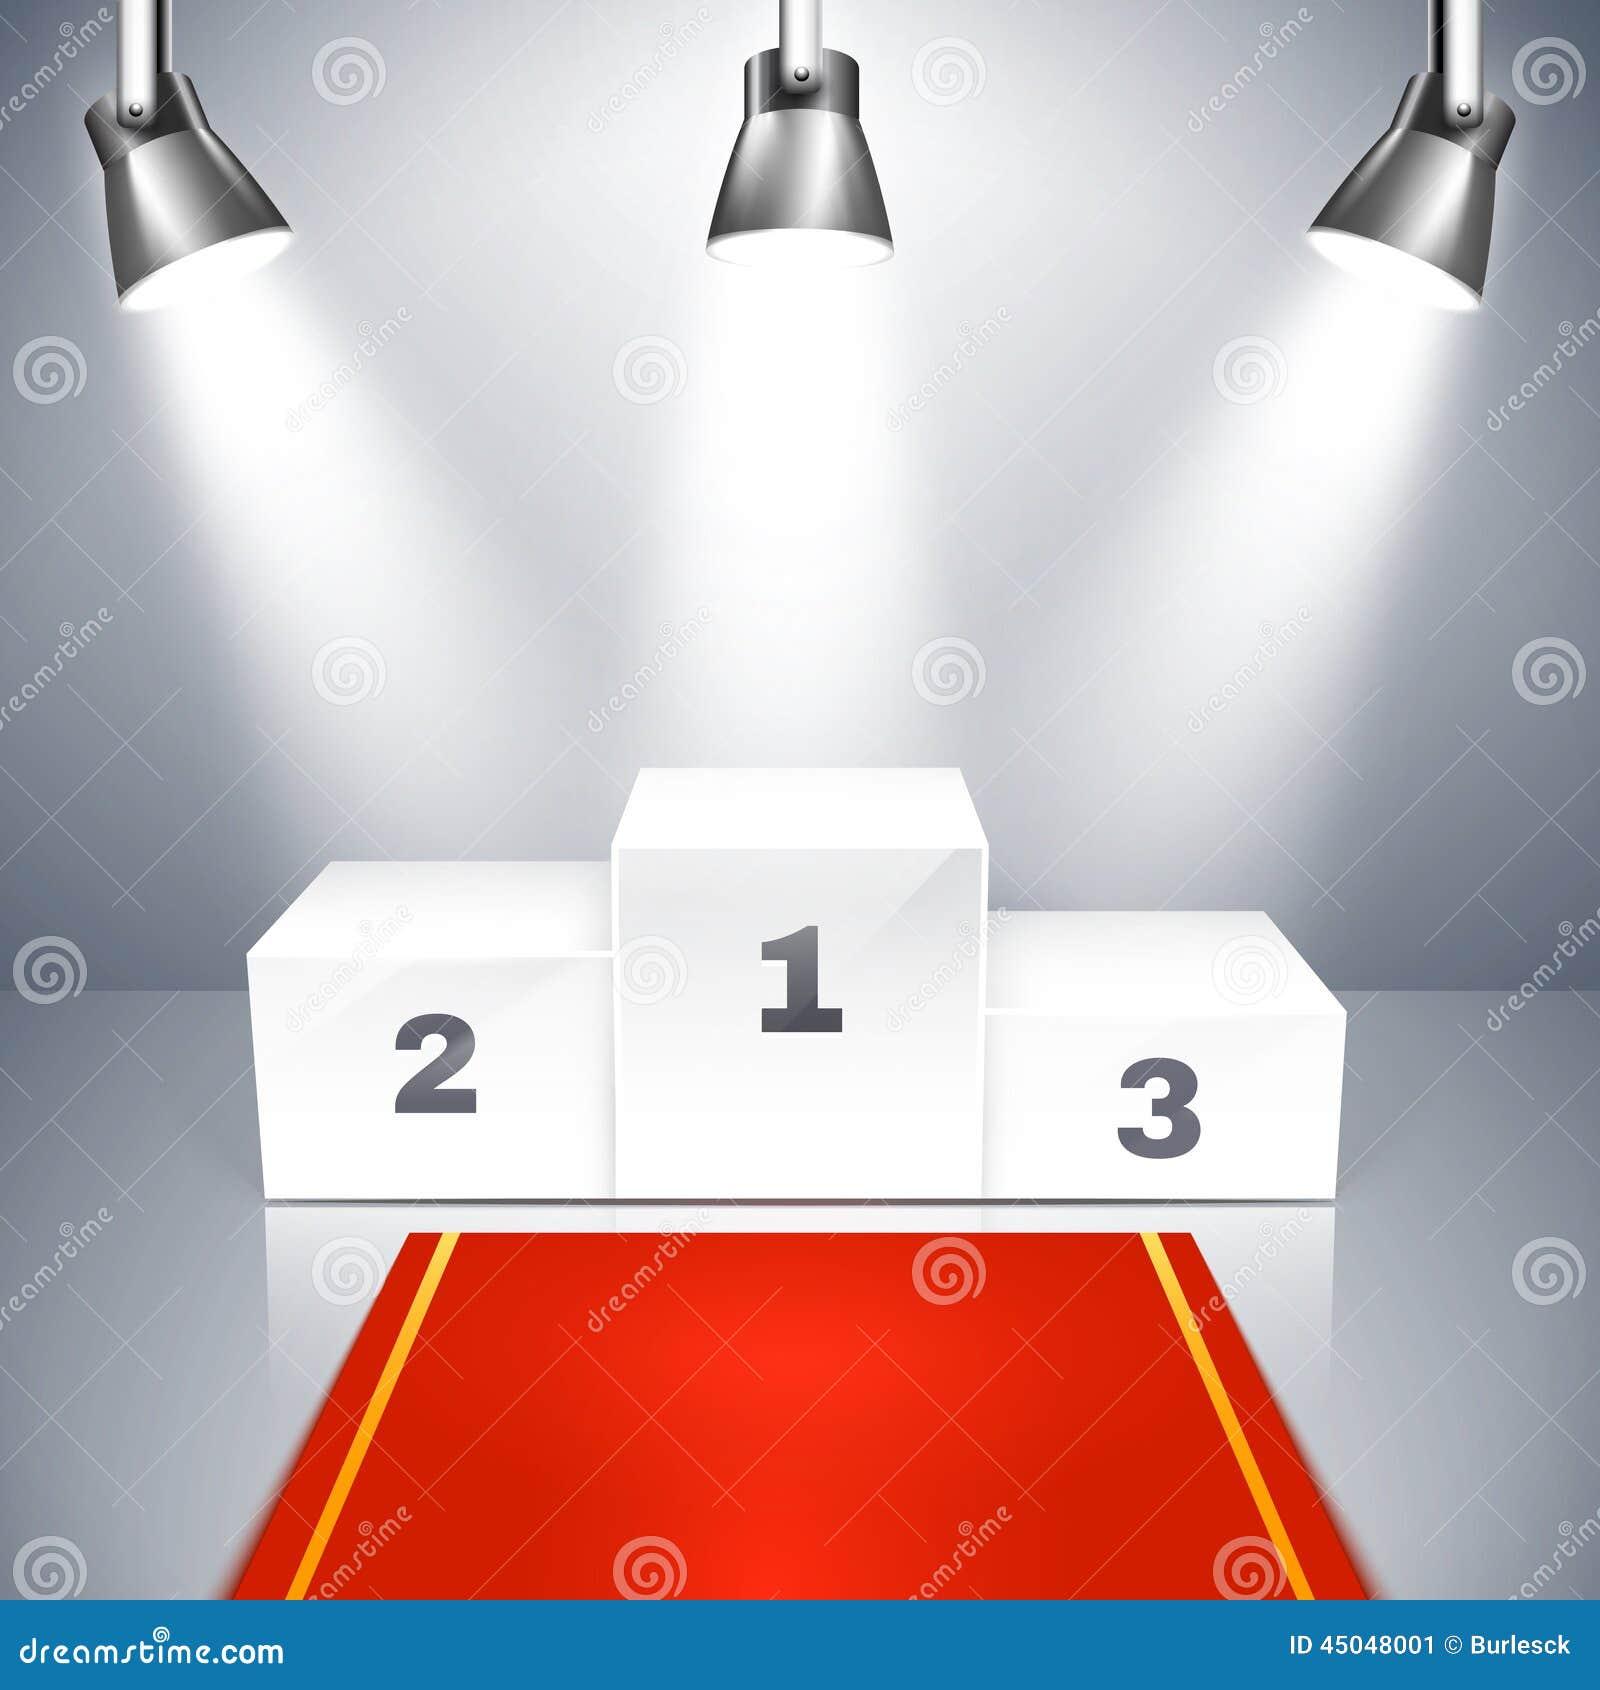 Empty Winners Podium With Spotlights Stock Vector - Image: 45048001